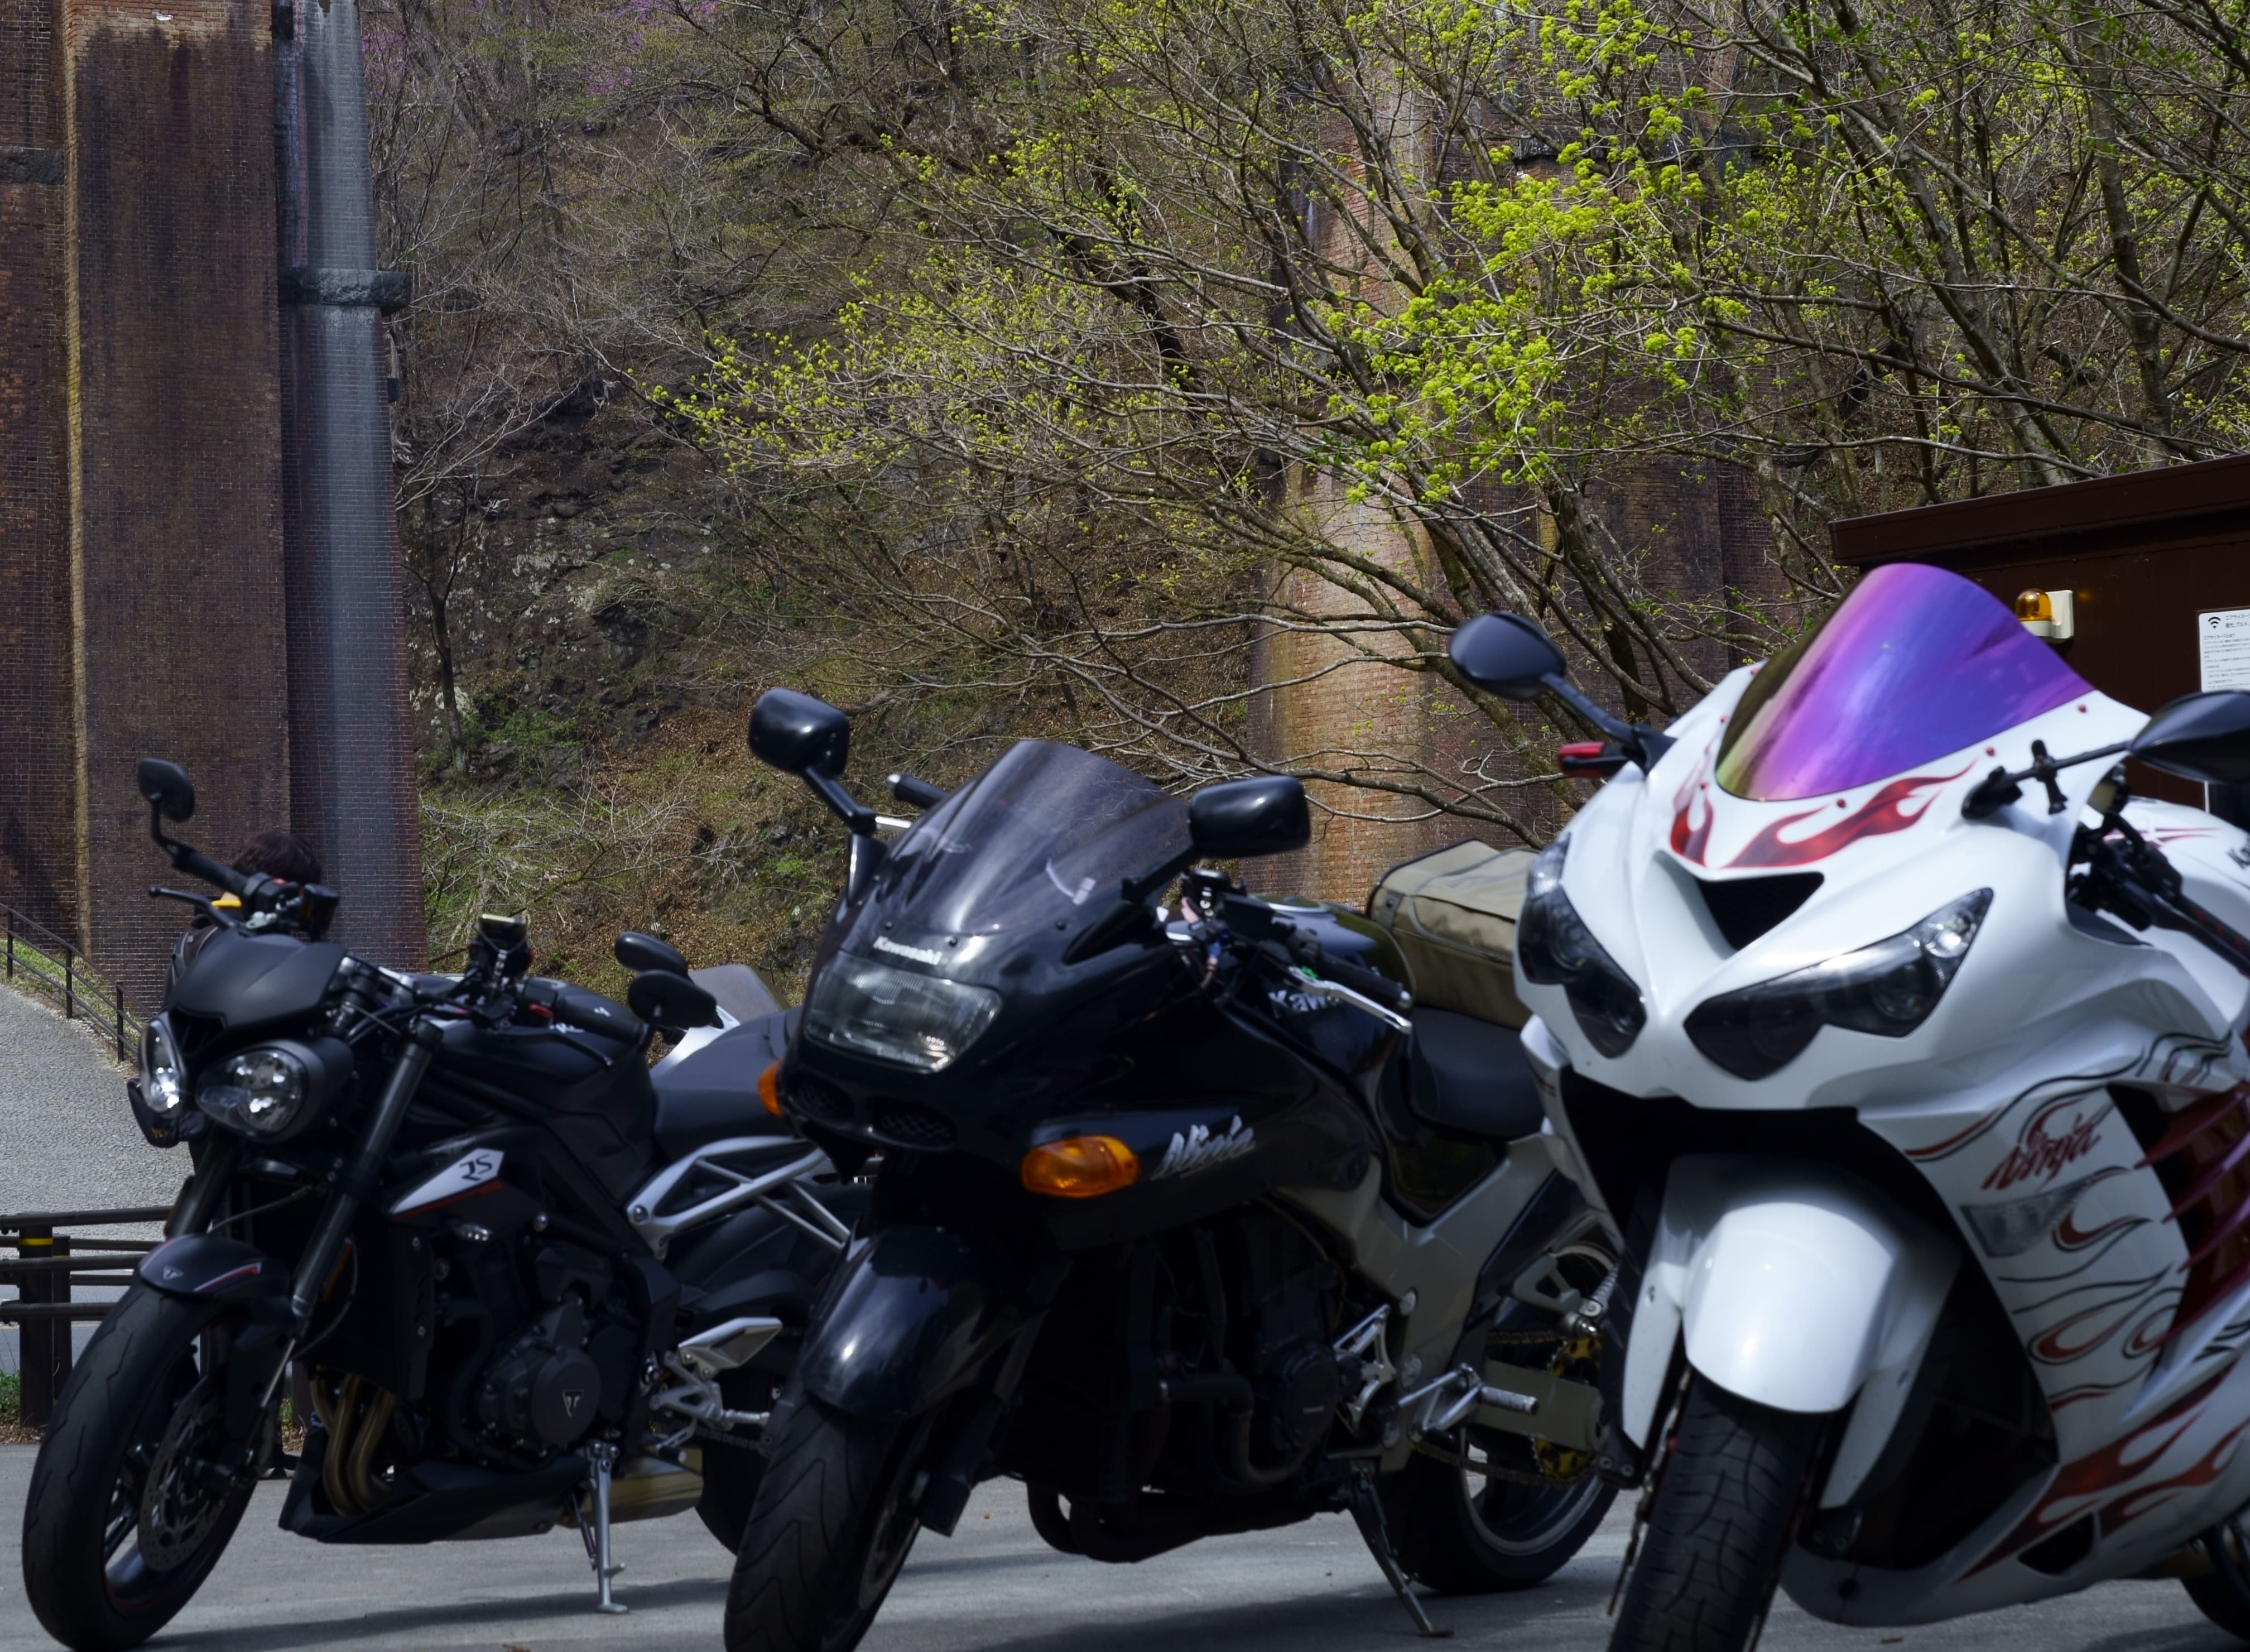 f:id:gaku-bikelife:20190509140850j:plain